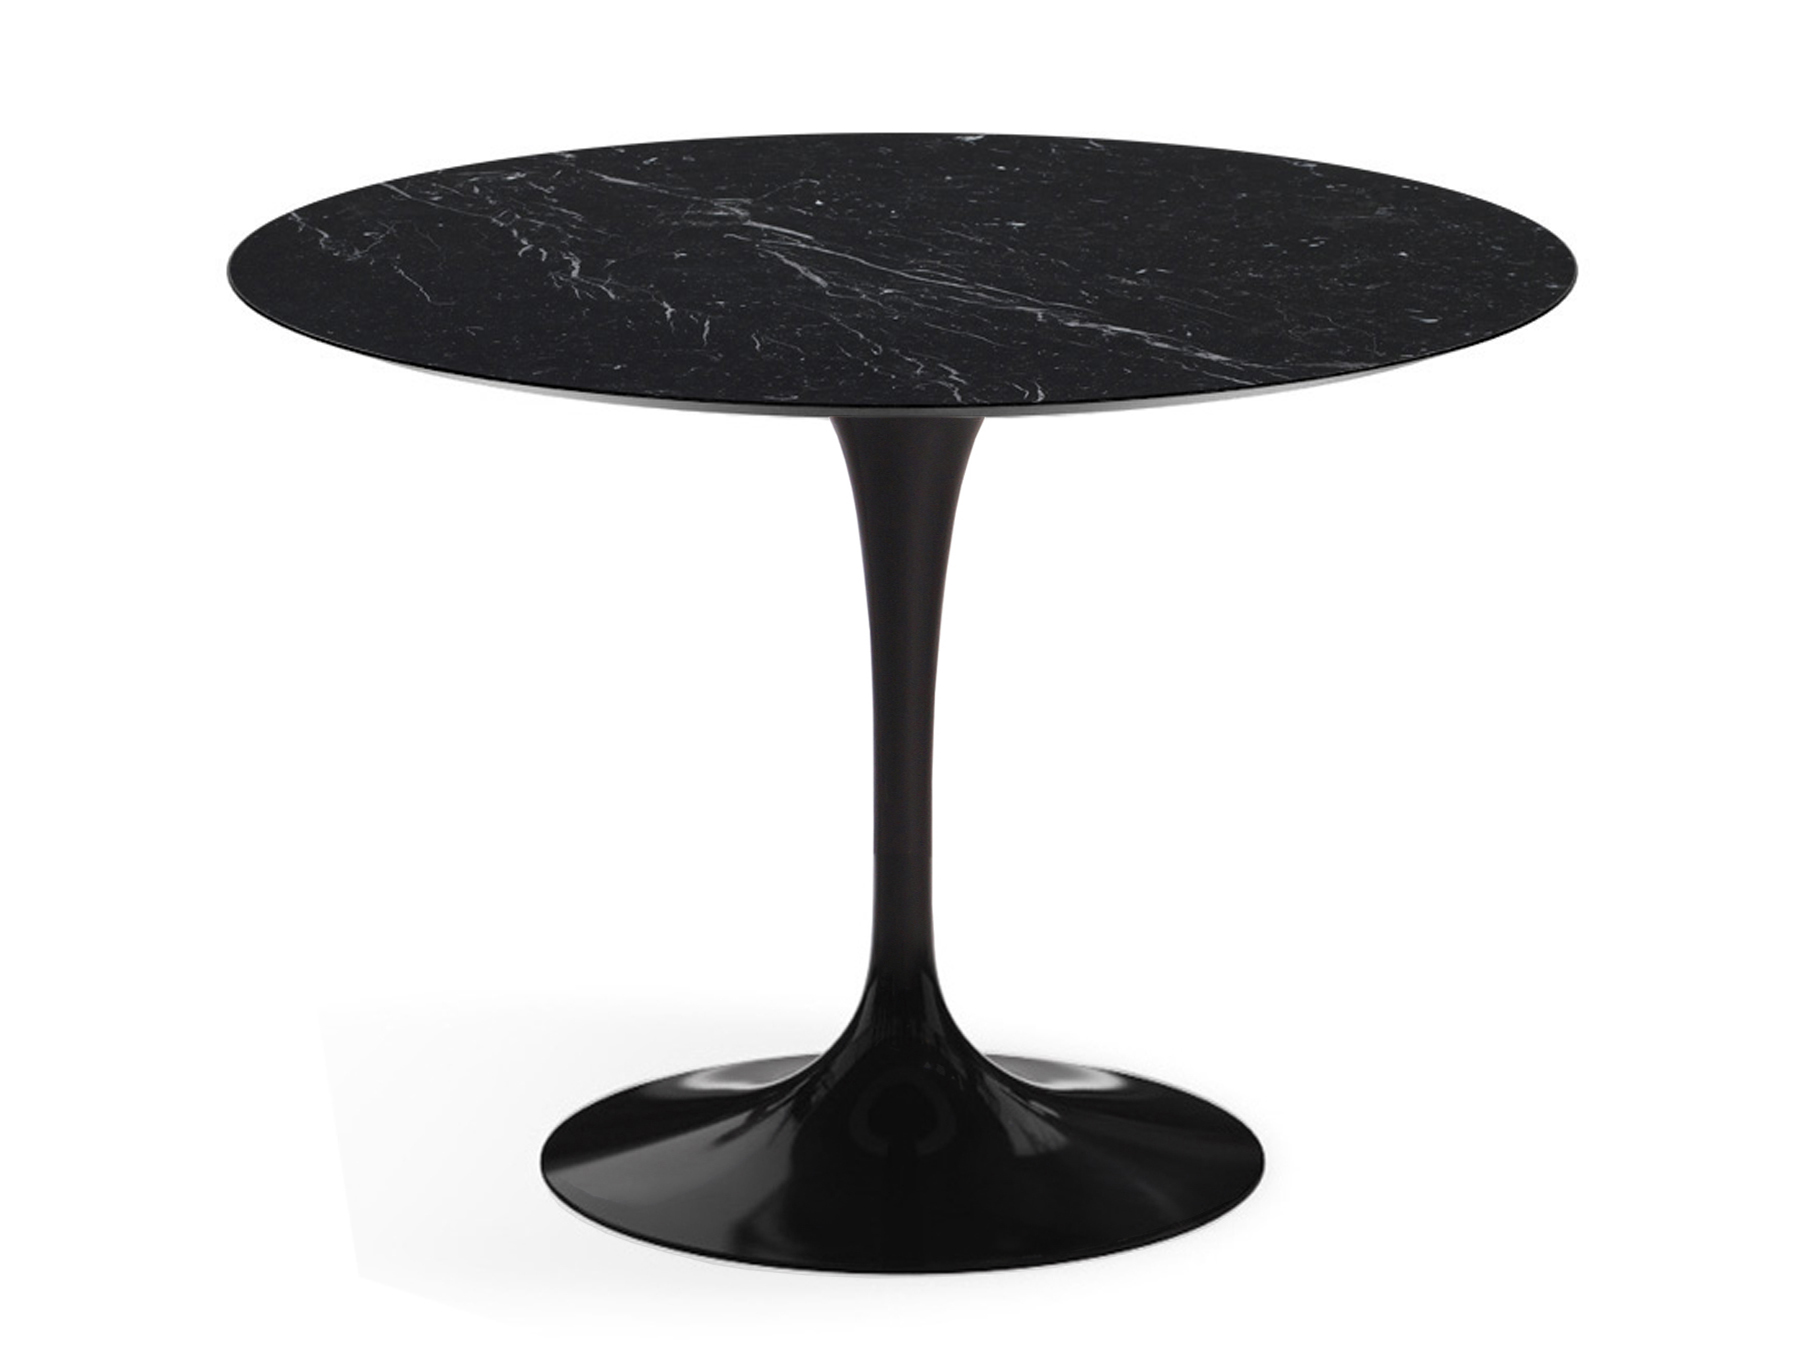 Кухонный стол ActualDesign 9981476 от thefurnish